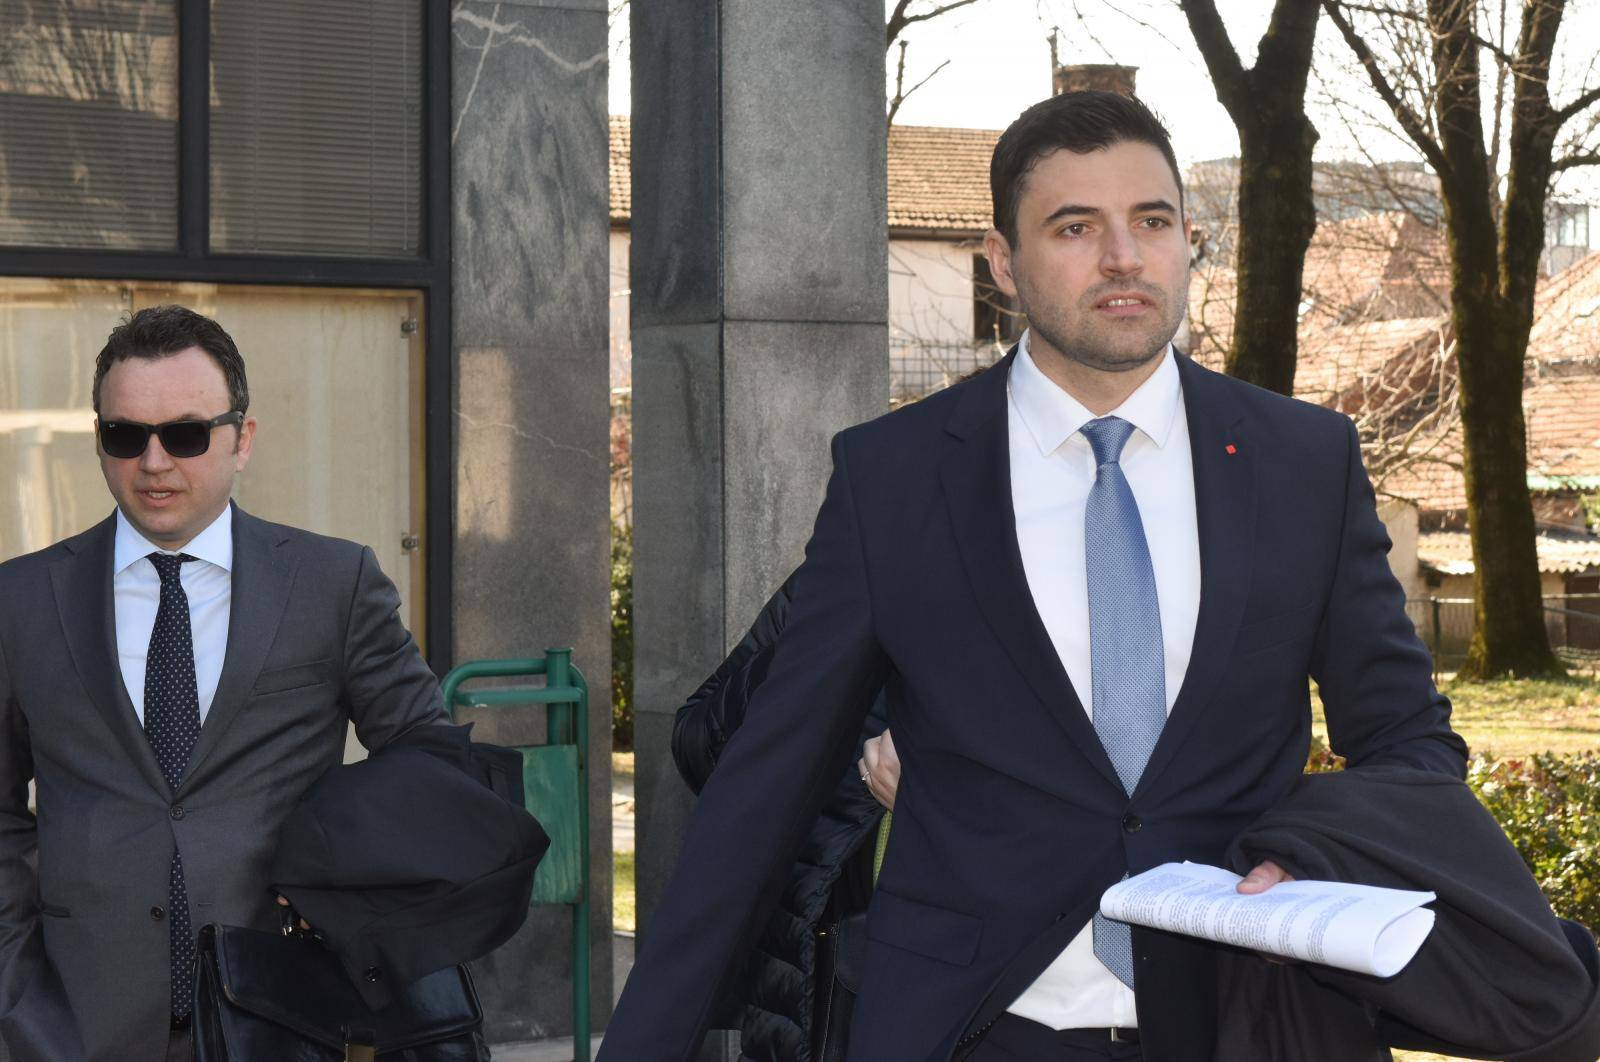 Zagreb: Održano ročište povodom tužbe Ante Ramljaka protiv Davora Bernardića